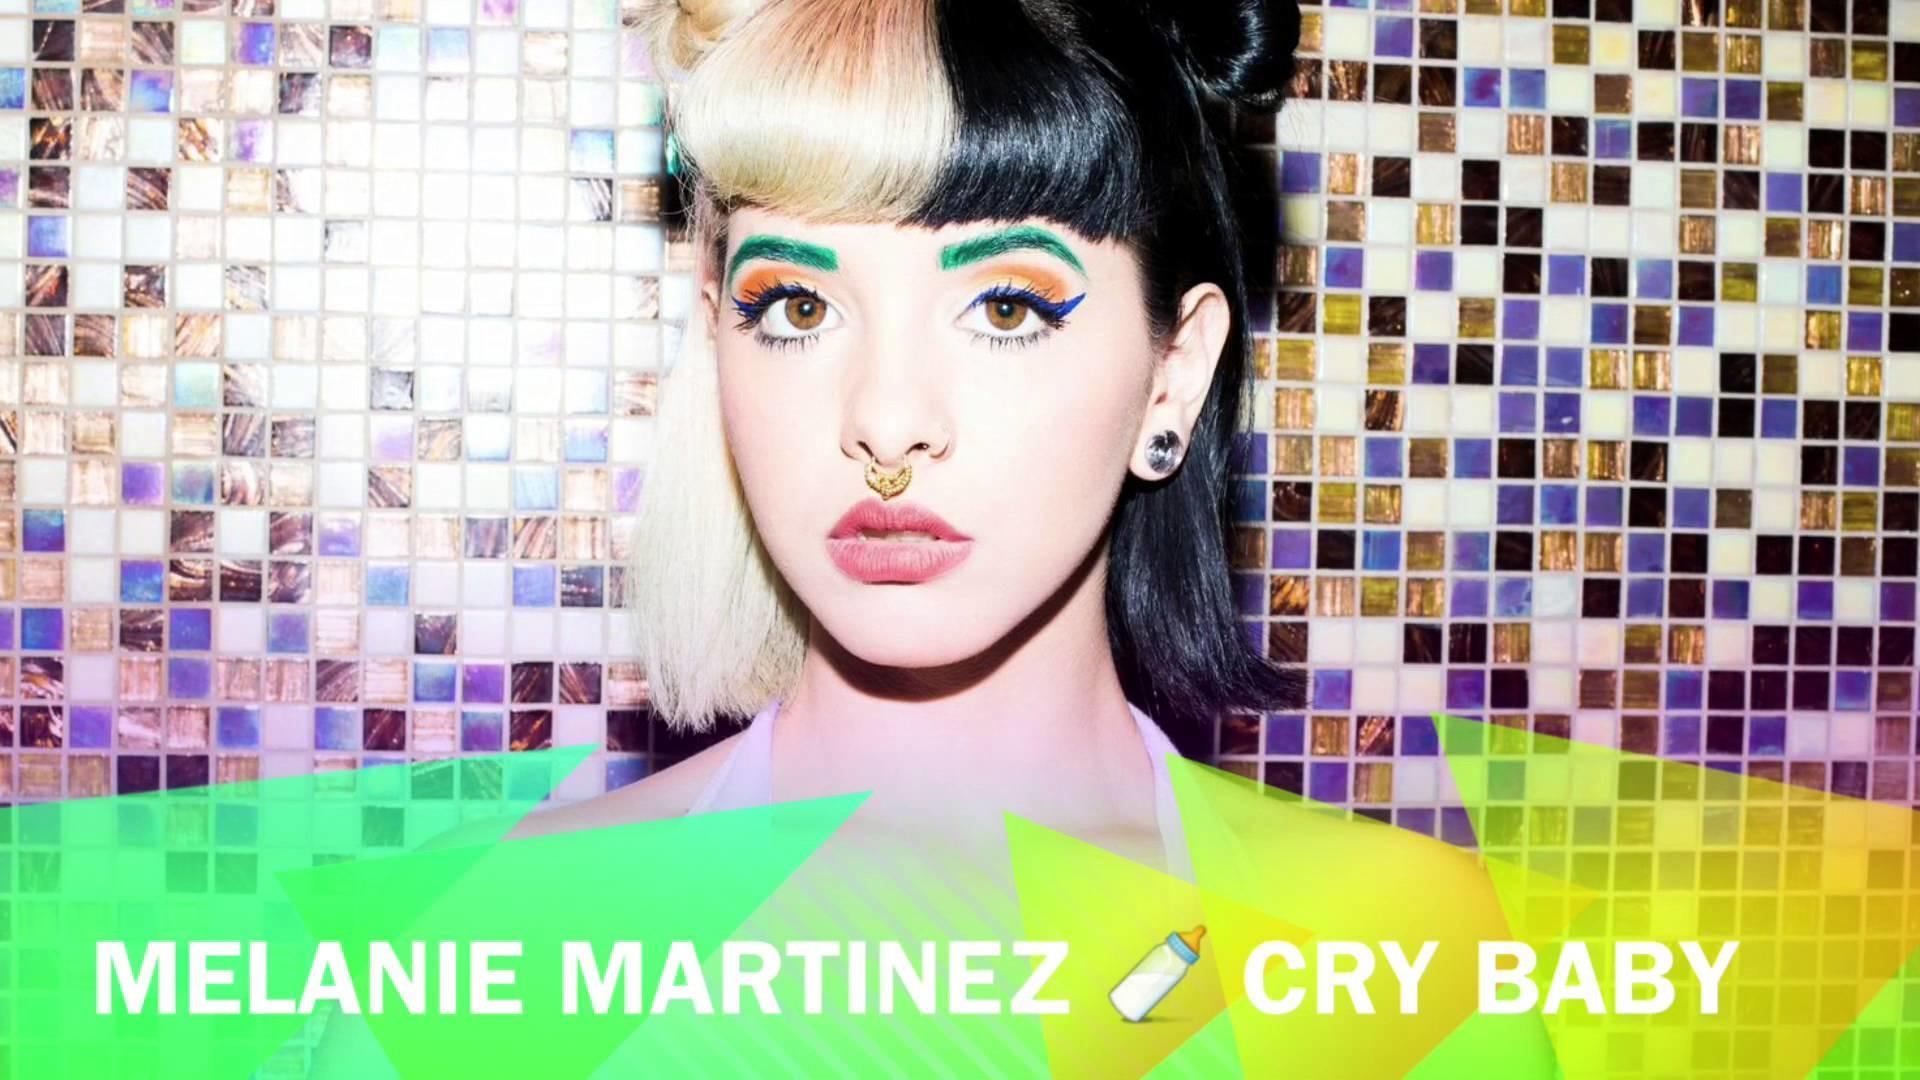 melanie martinez – crybaby [sped up/nightcore]